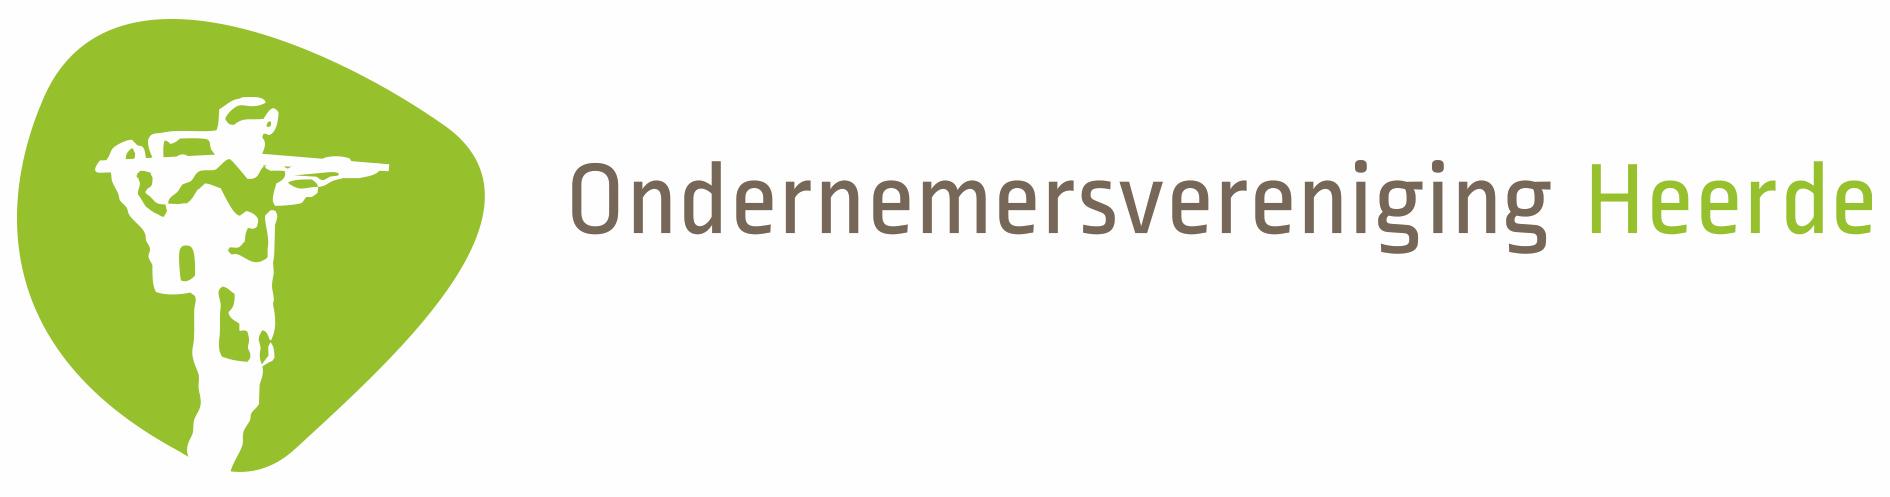 Ondernemersvereniging Heerde